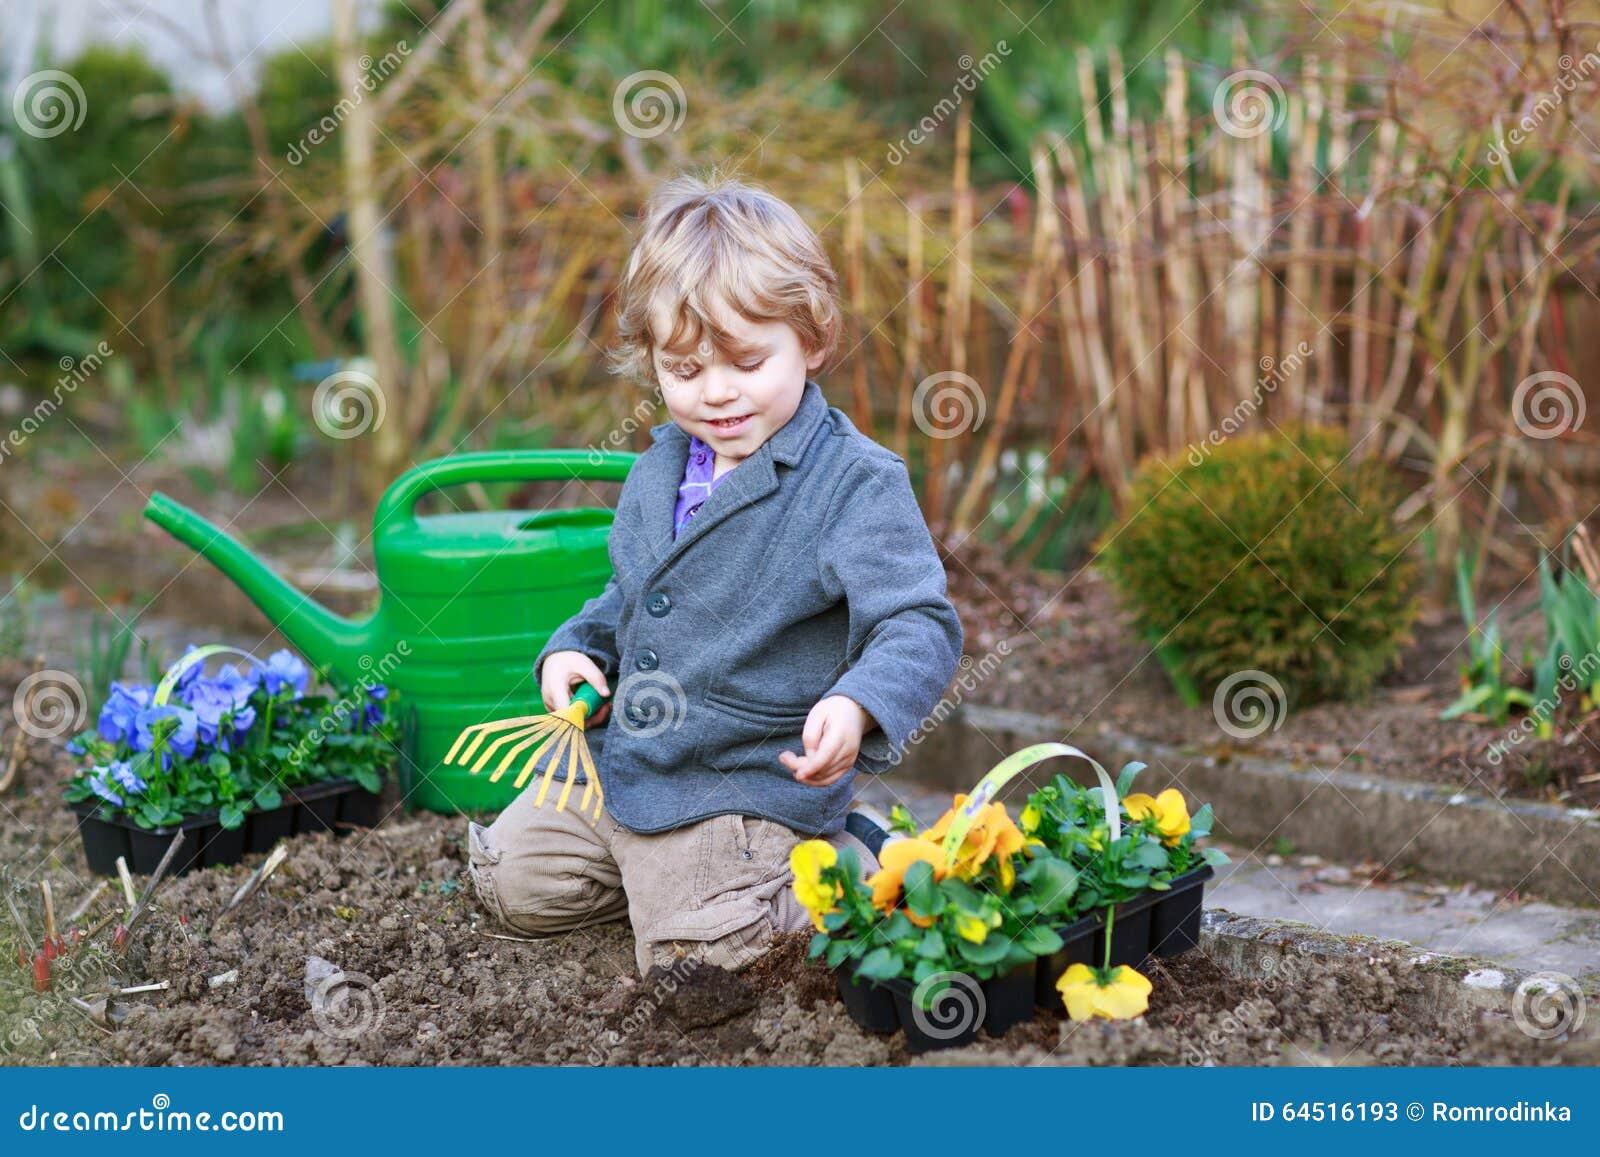 Boy gardening planting flowers blond years having fun vegetable plants